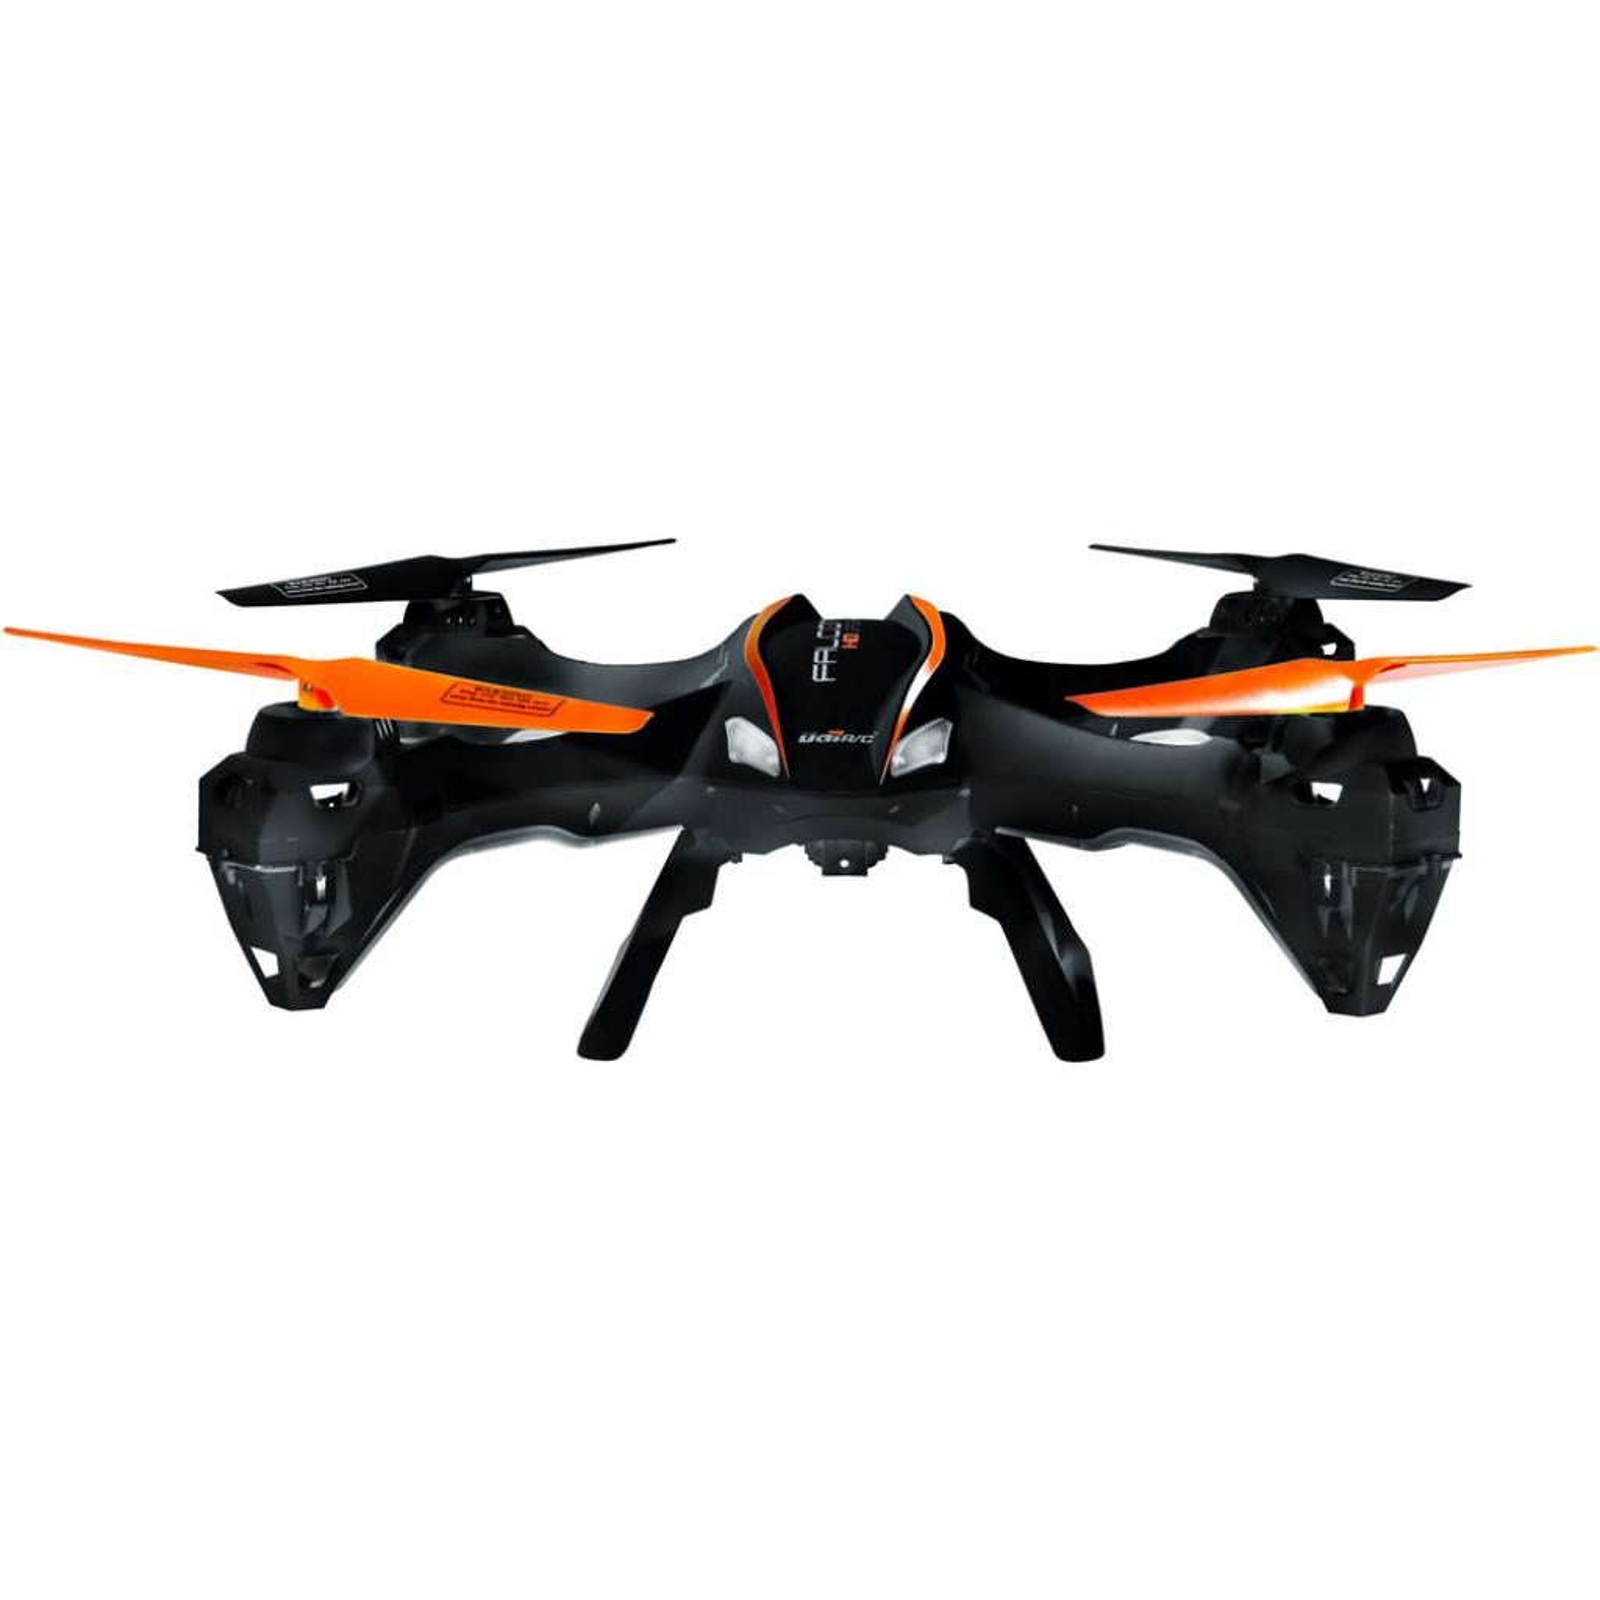 Квадрокоптер UDIRC U842 FALCON 2,4 GHz 486 мм HD бортовая камера 4CH (U842 Black) изображение 2